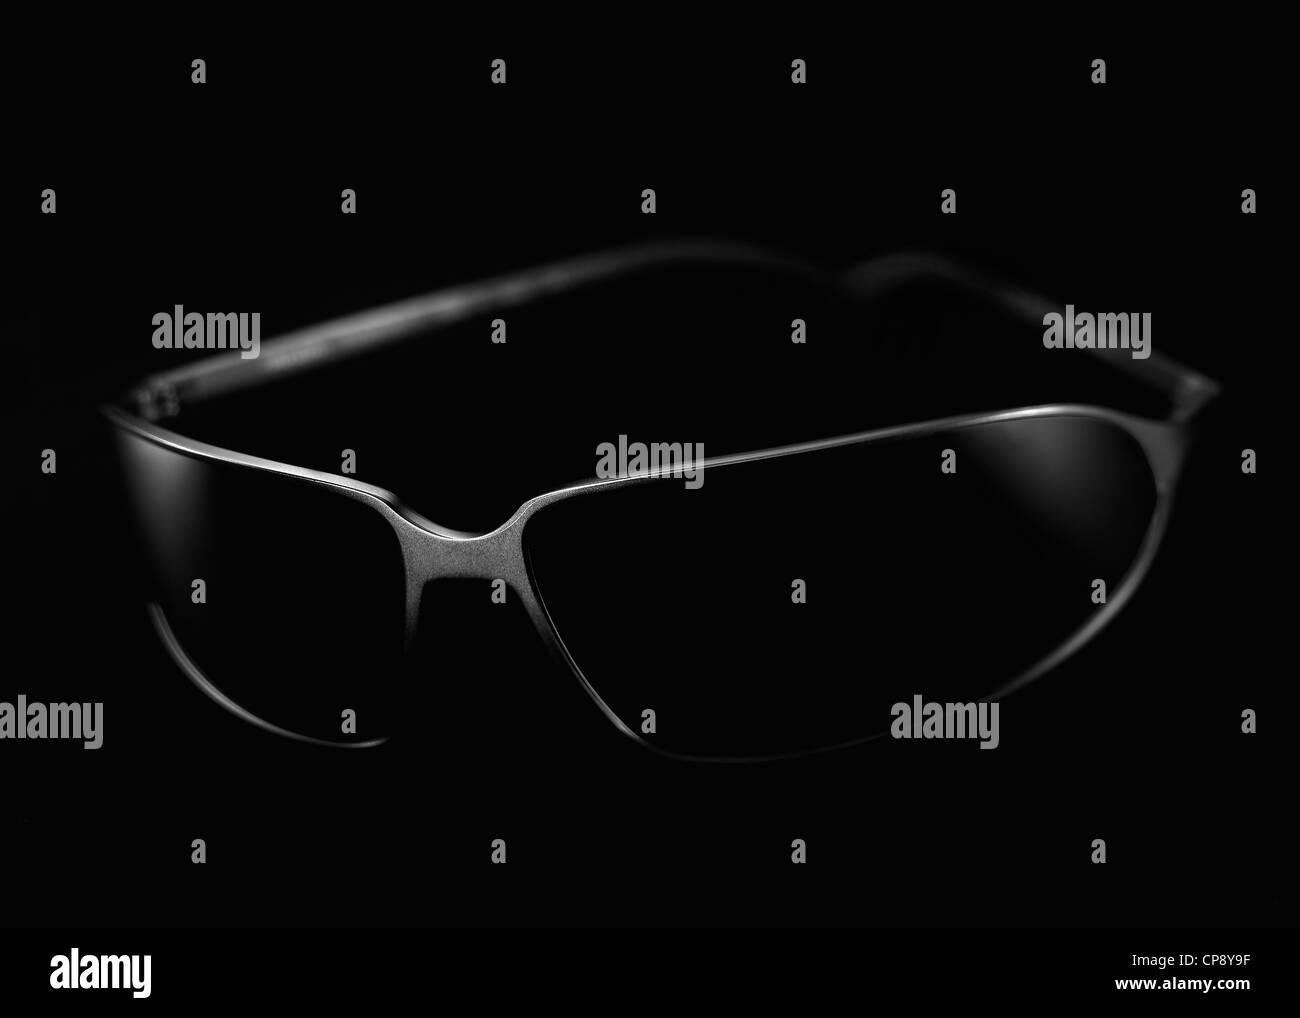 Sunglass on black background, close up - Stock Image